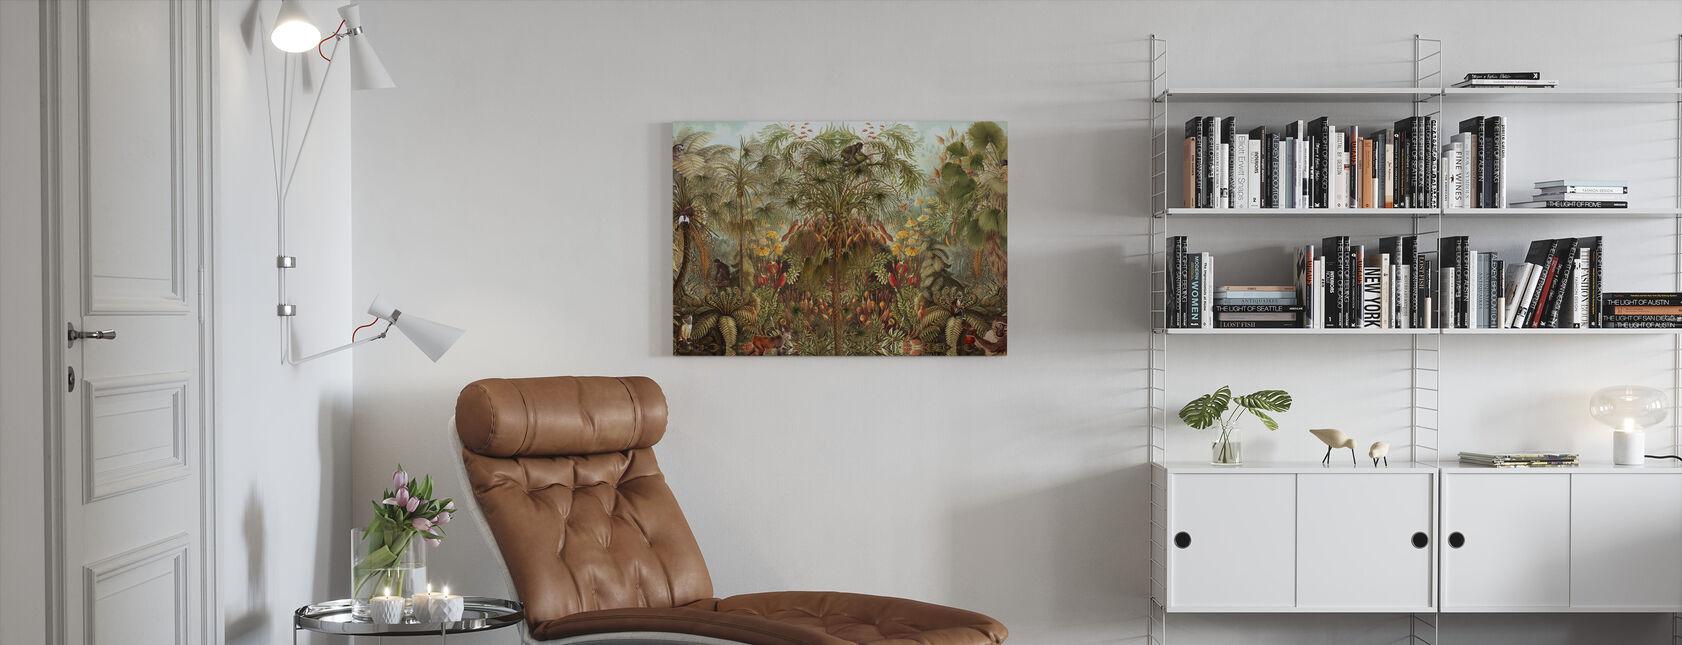 Apina Katso apina Wah - Canvastaulu - Olohuone